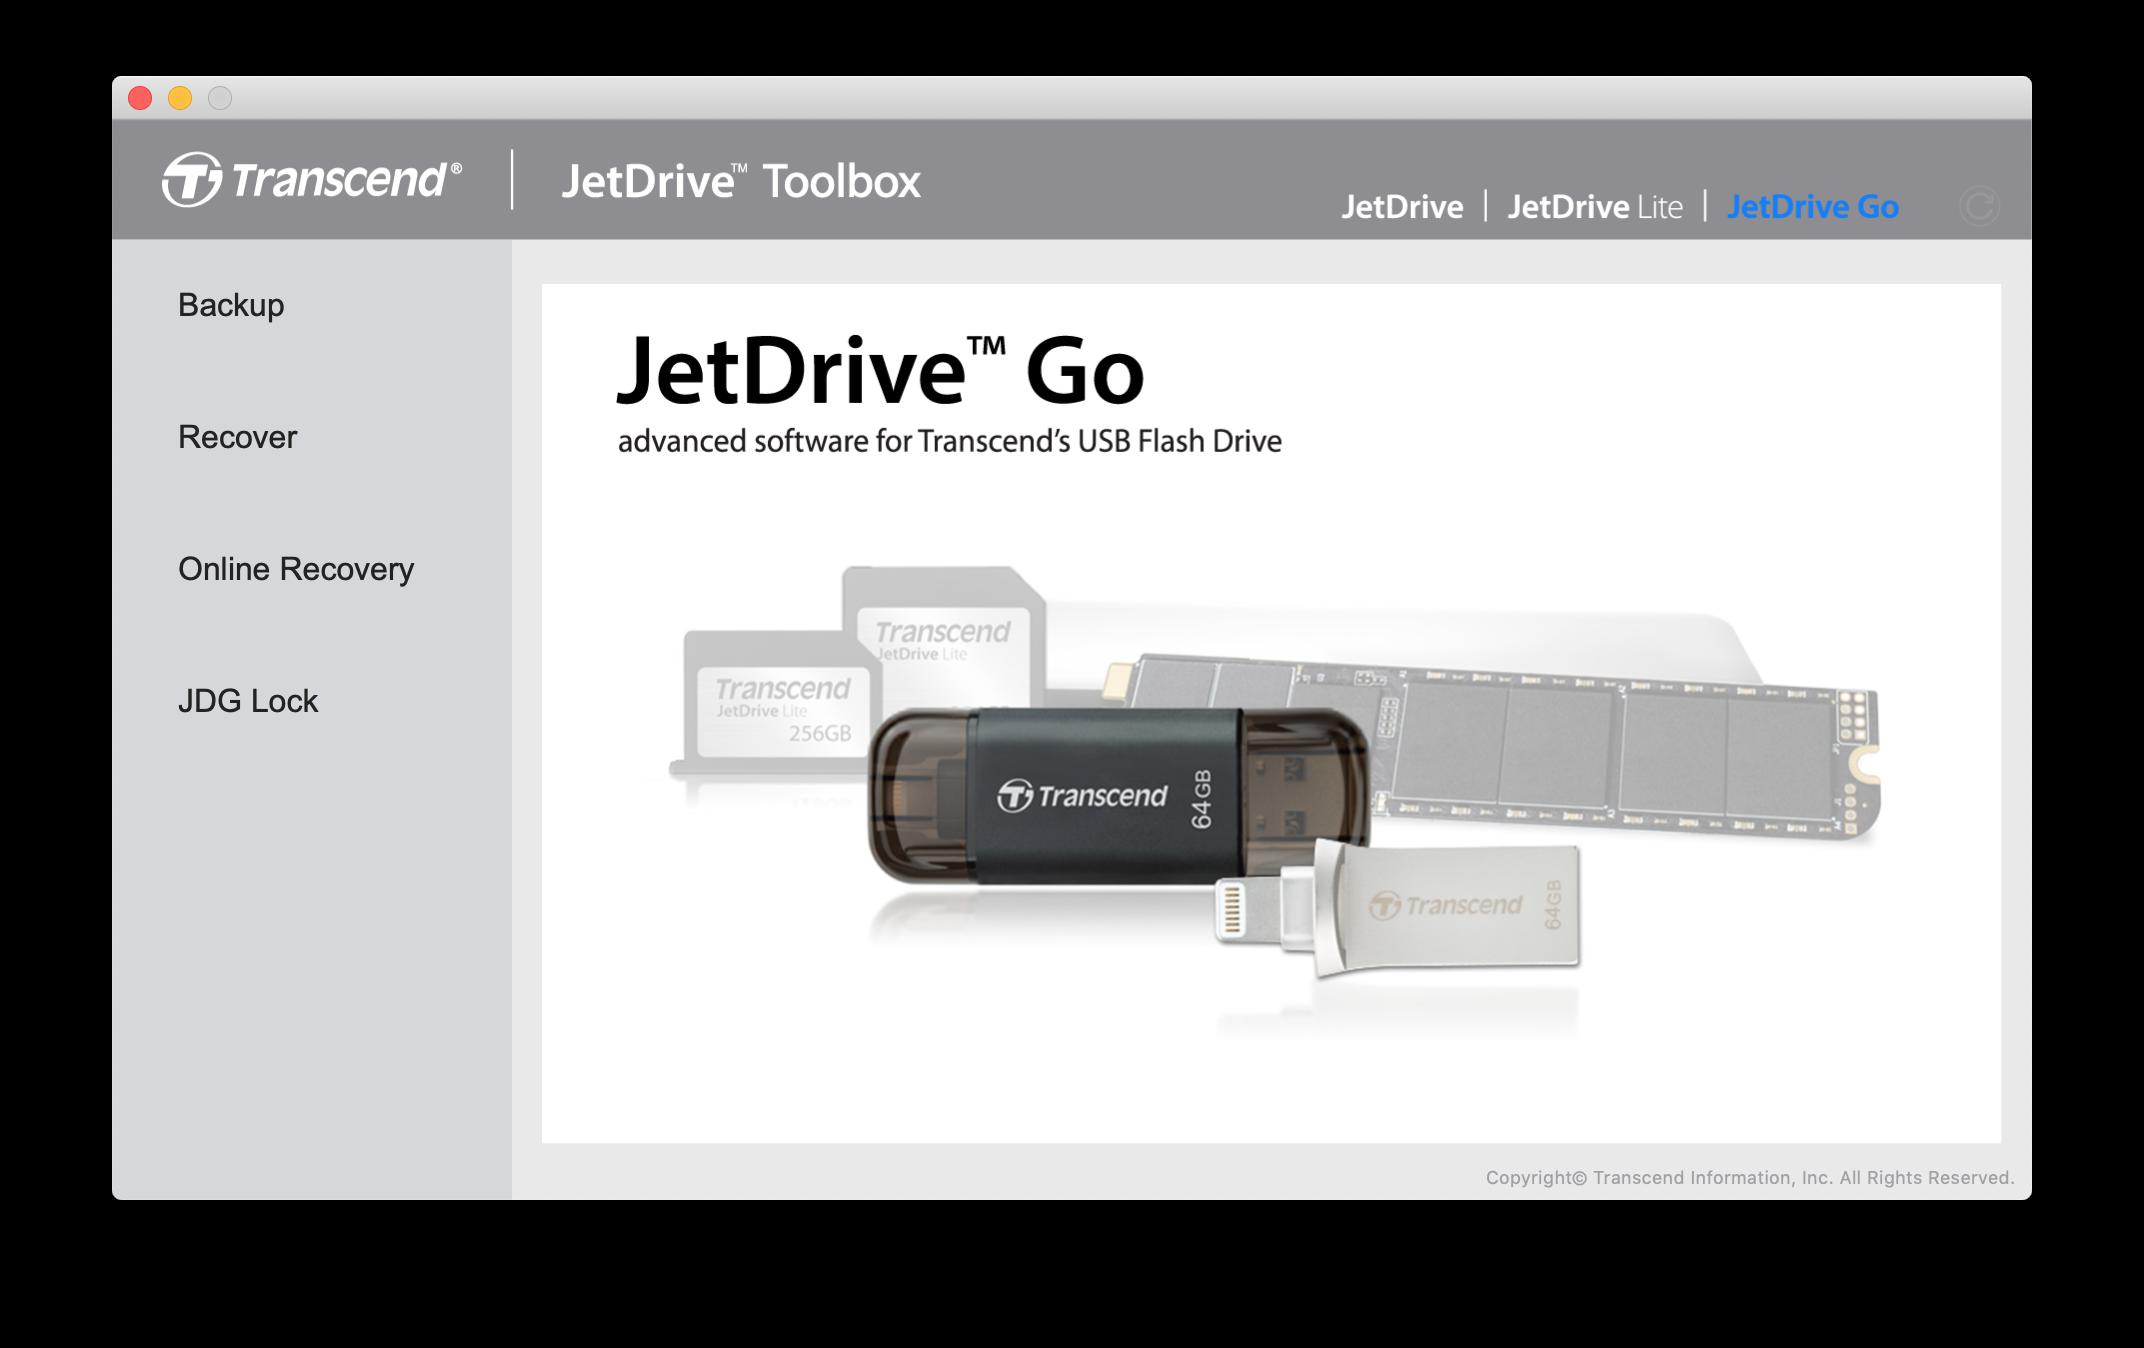 Jetdrive Toolbox Support Download Transcend Storejet 1tb 25amp039 Usb 30 25m3 View All